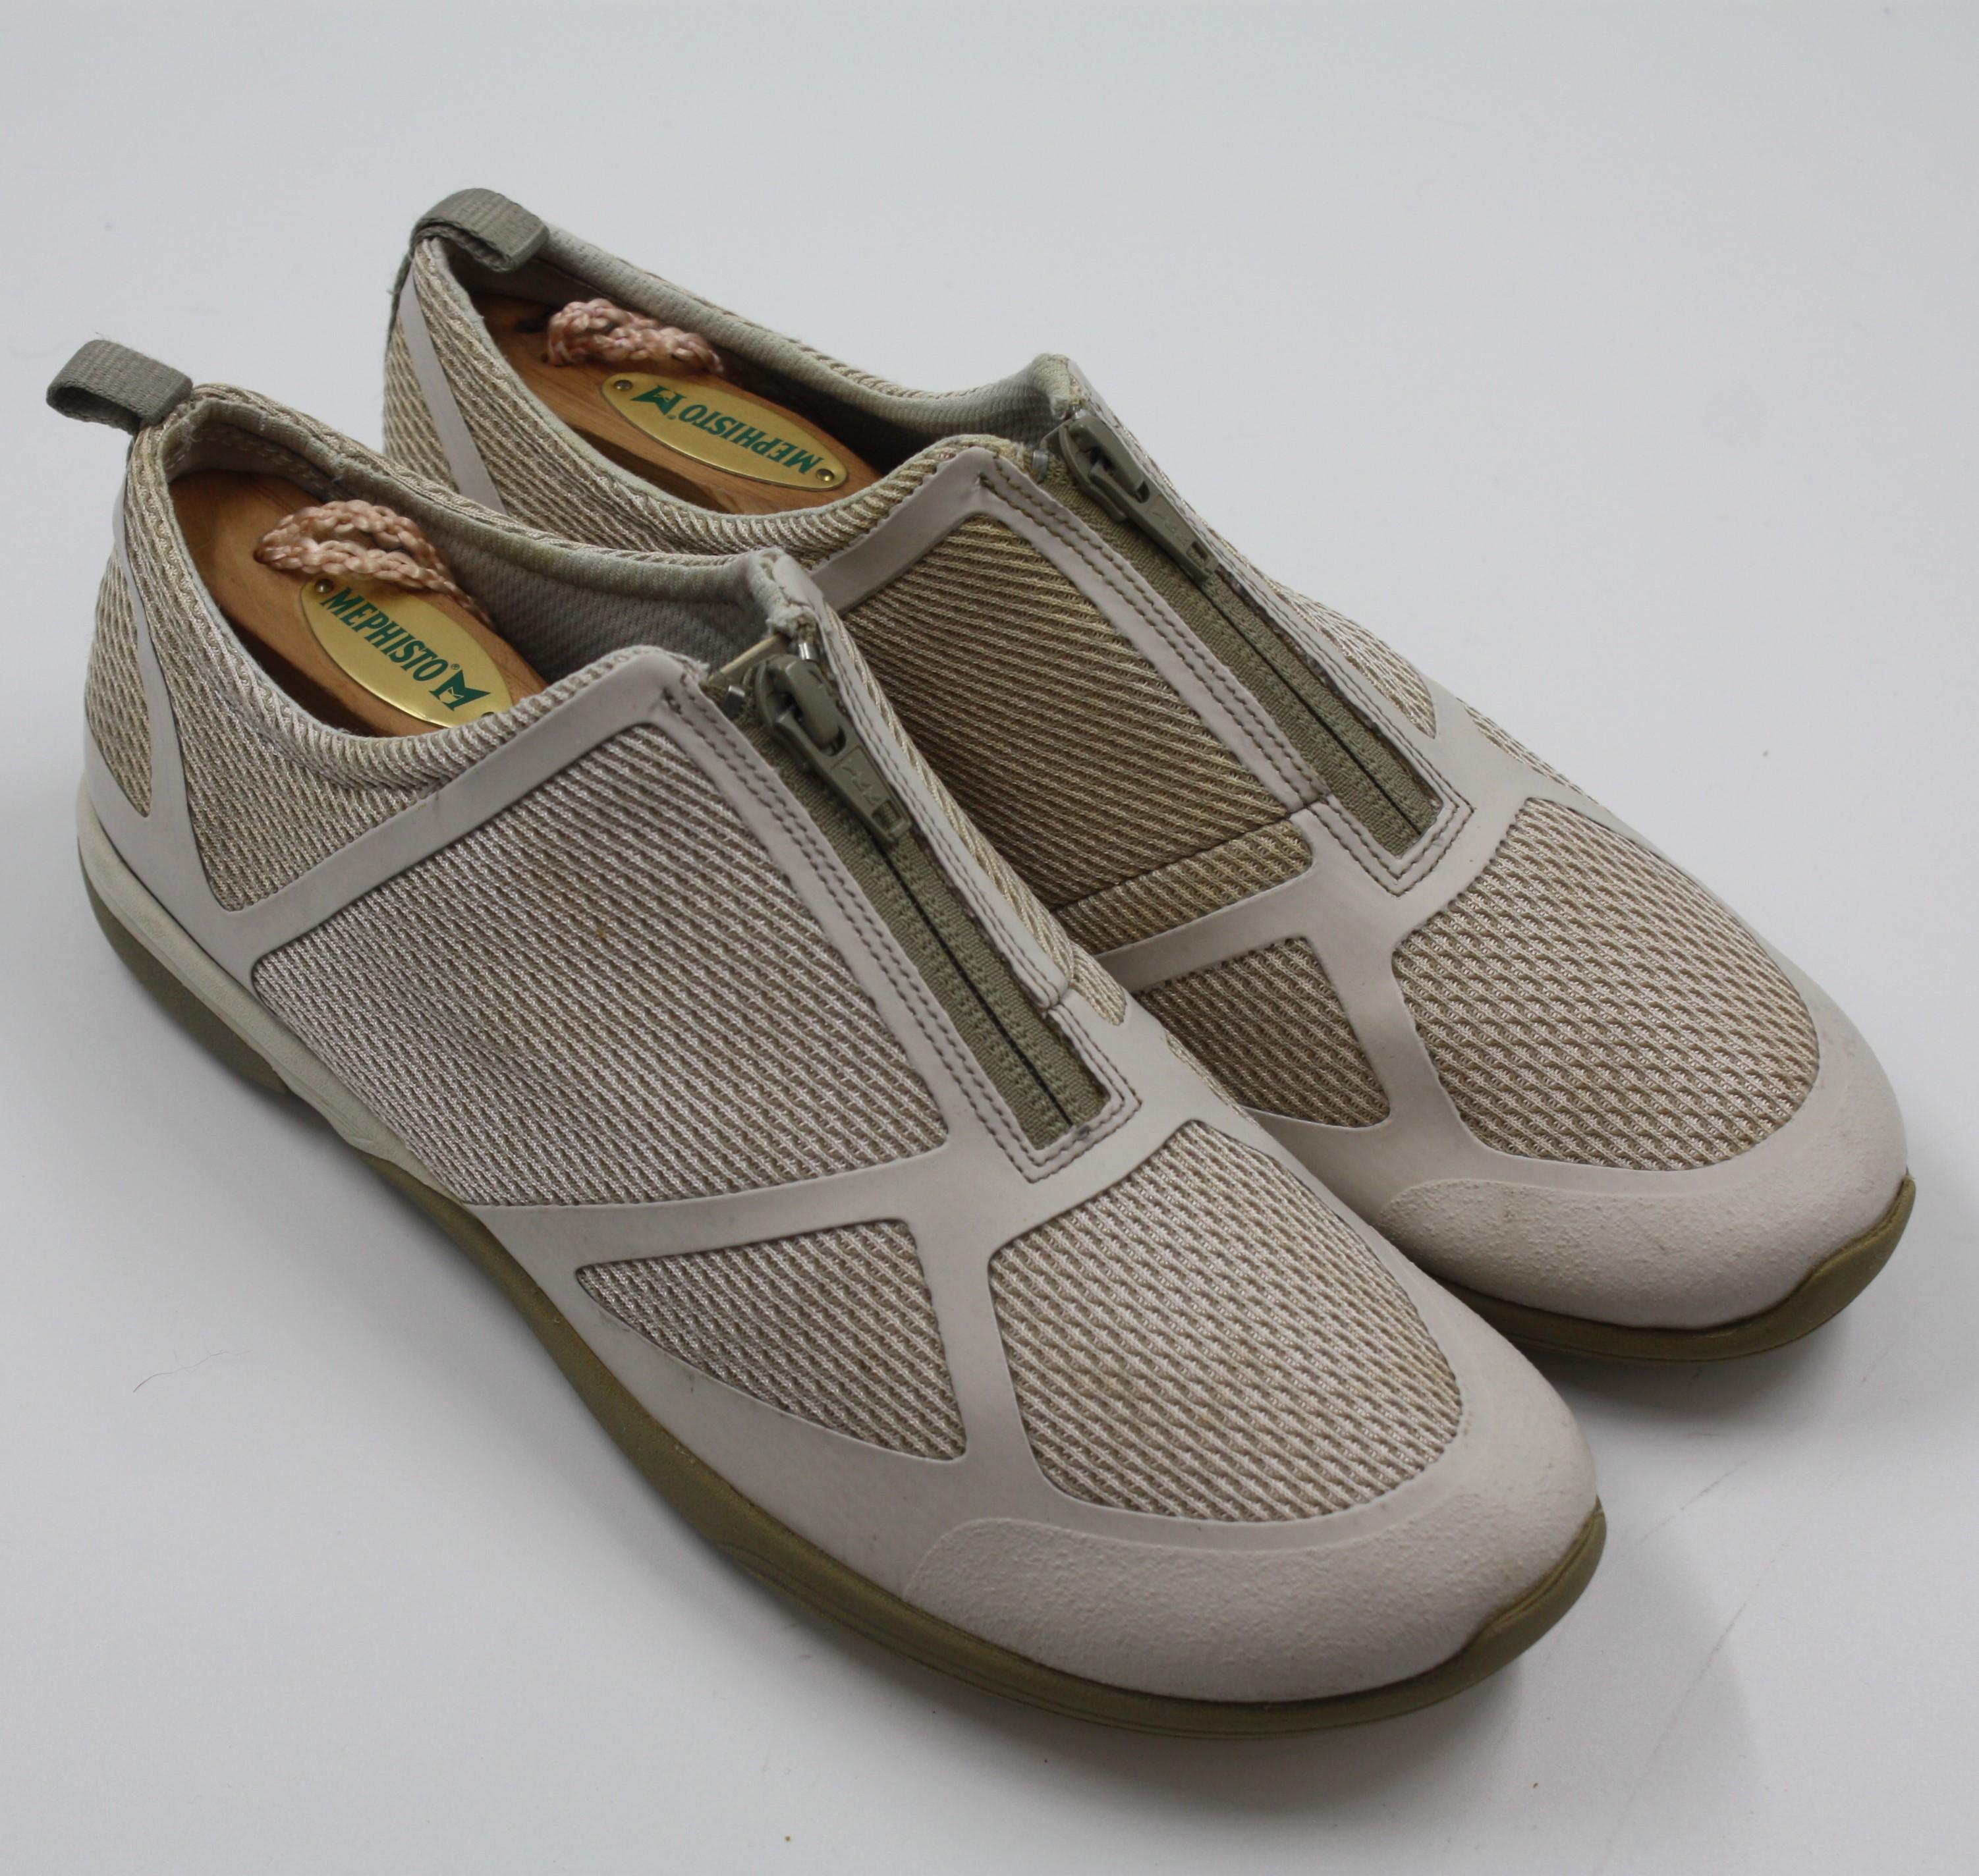 02808e4858f8 Merrell Womens Ladies Taupe Zipper Slip On Flats Shoes Size 8M